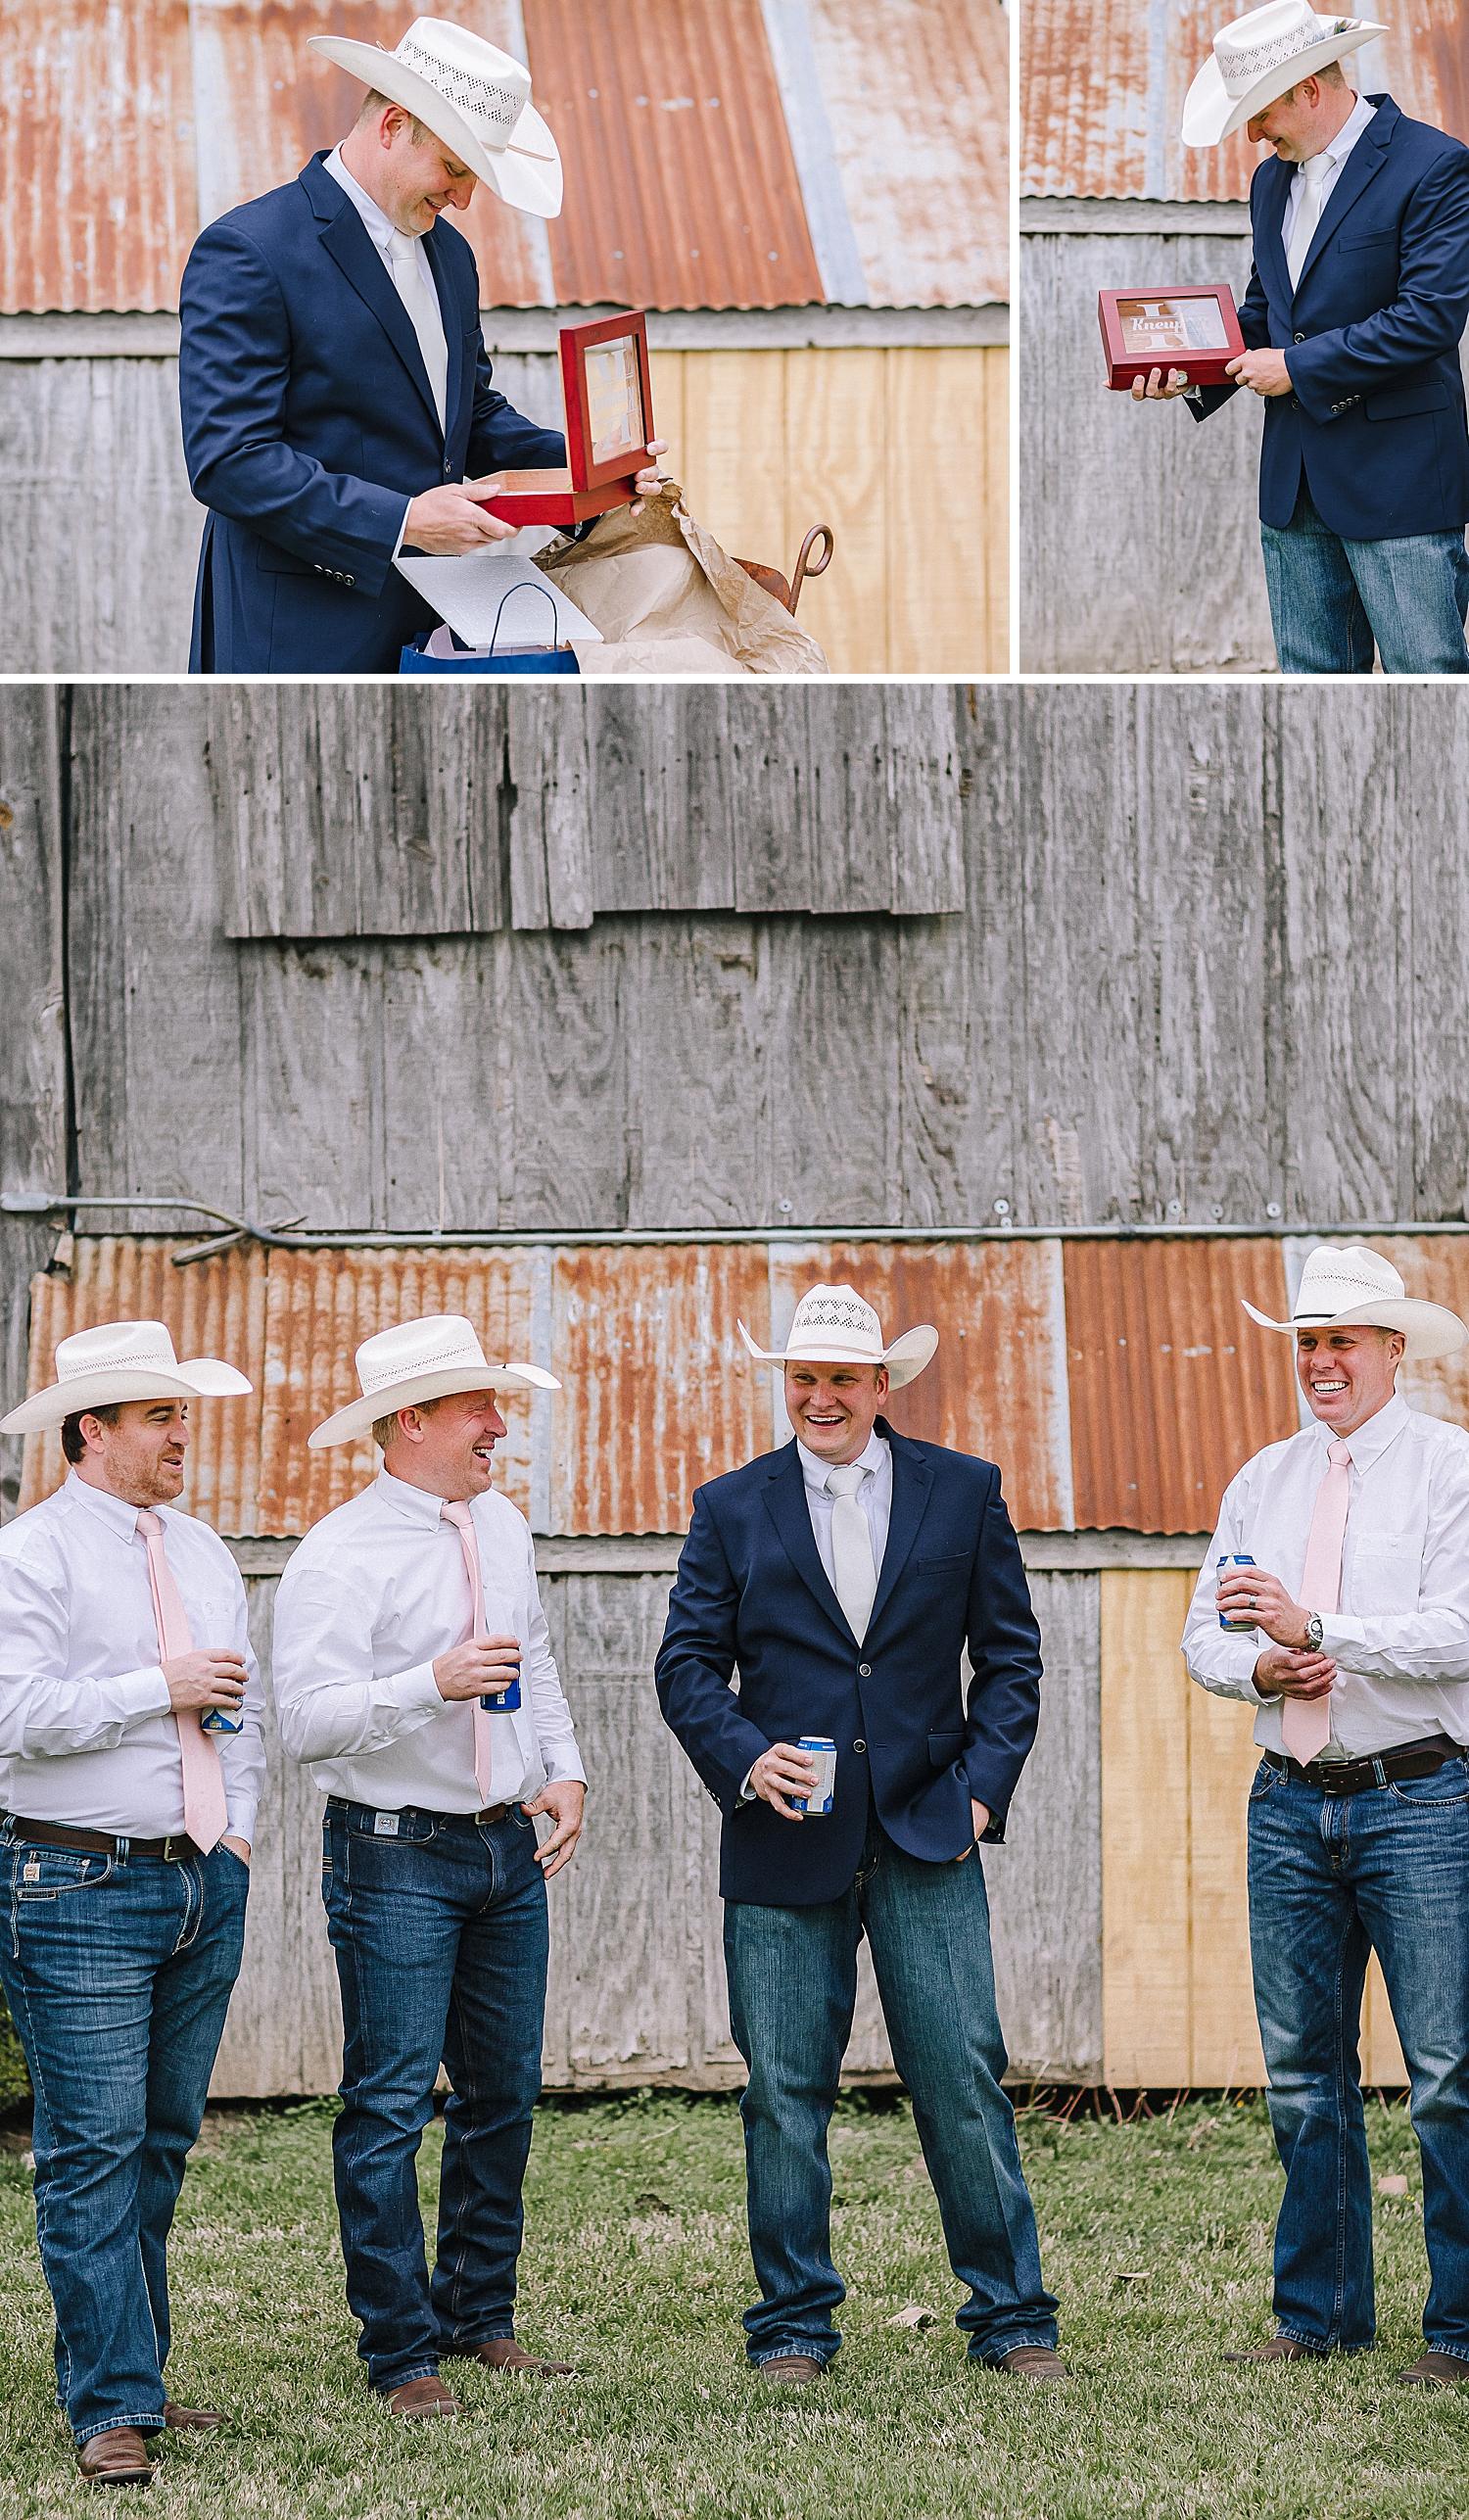 Rio-Cibilo-Ranch-Marion-Texas-Wedding-Rustic-Blush-Rose-Quartz-Details-Carly-Barton-Photography_0017.jpg